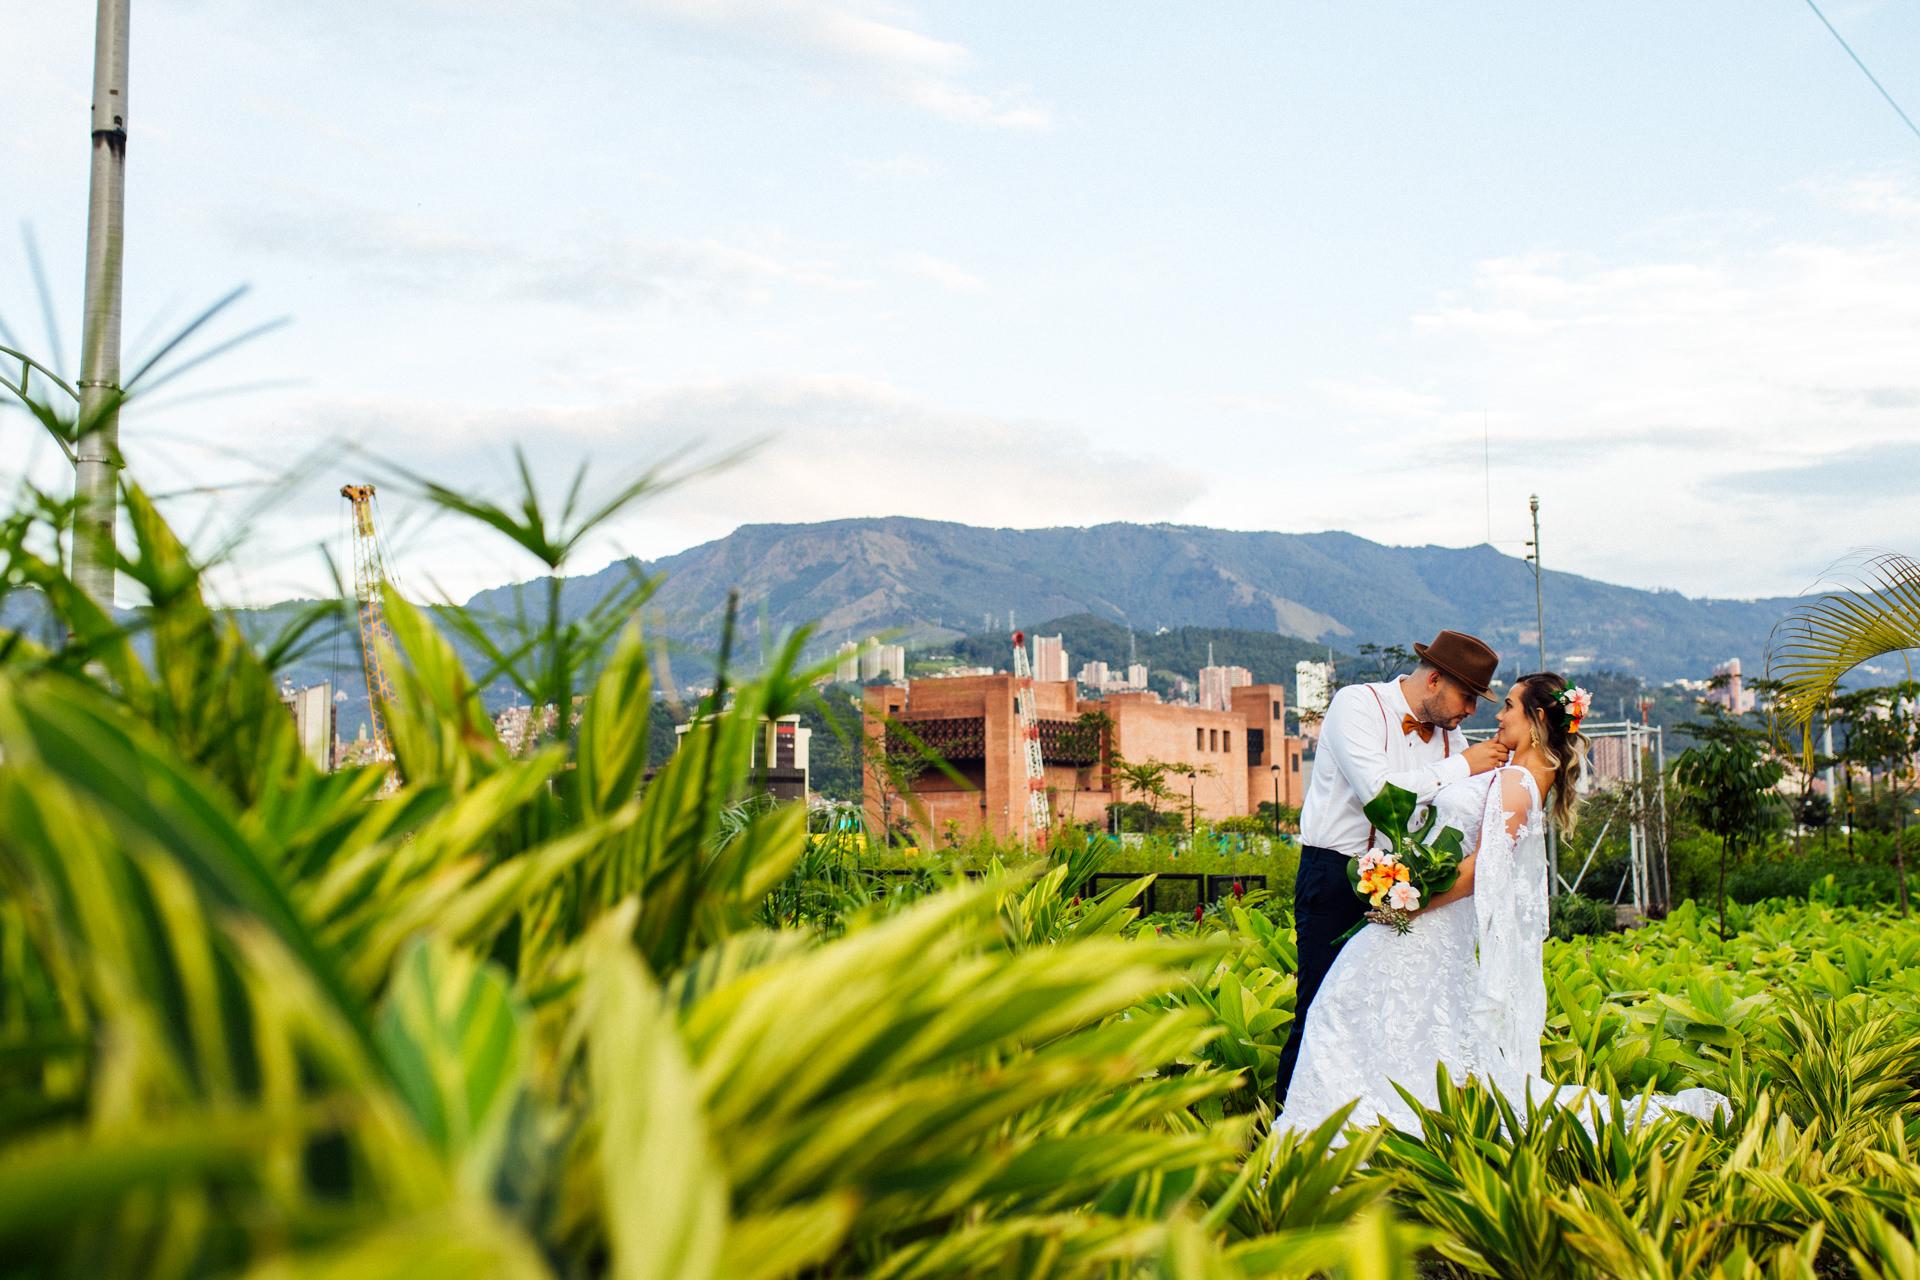 Wedding-Boda-Matrimonio-Fotografo-Fotografia-bodas-Medellin-Llanogrande-Colombia-Bogota-Cartagena-Miami-Wed-Destination-Photojournalism (170).JPG